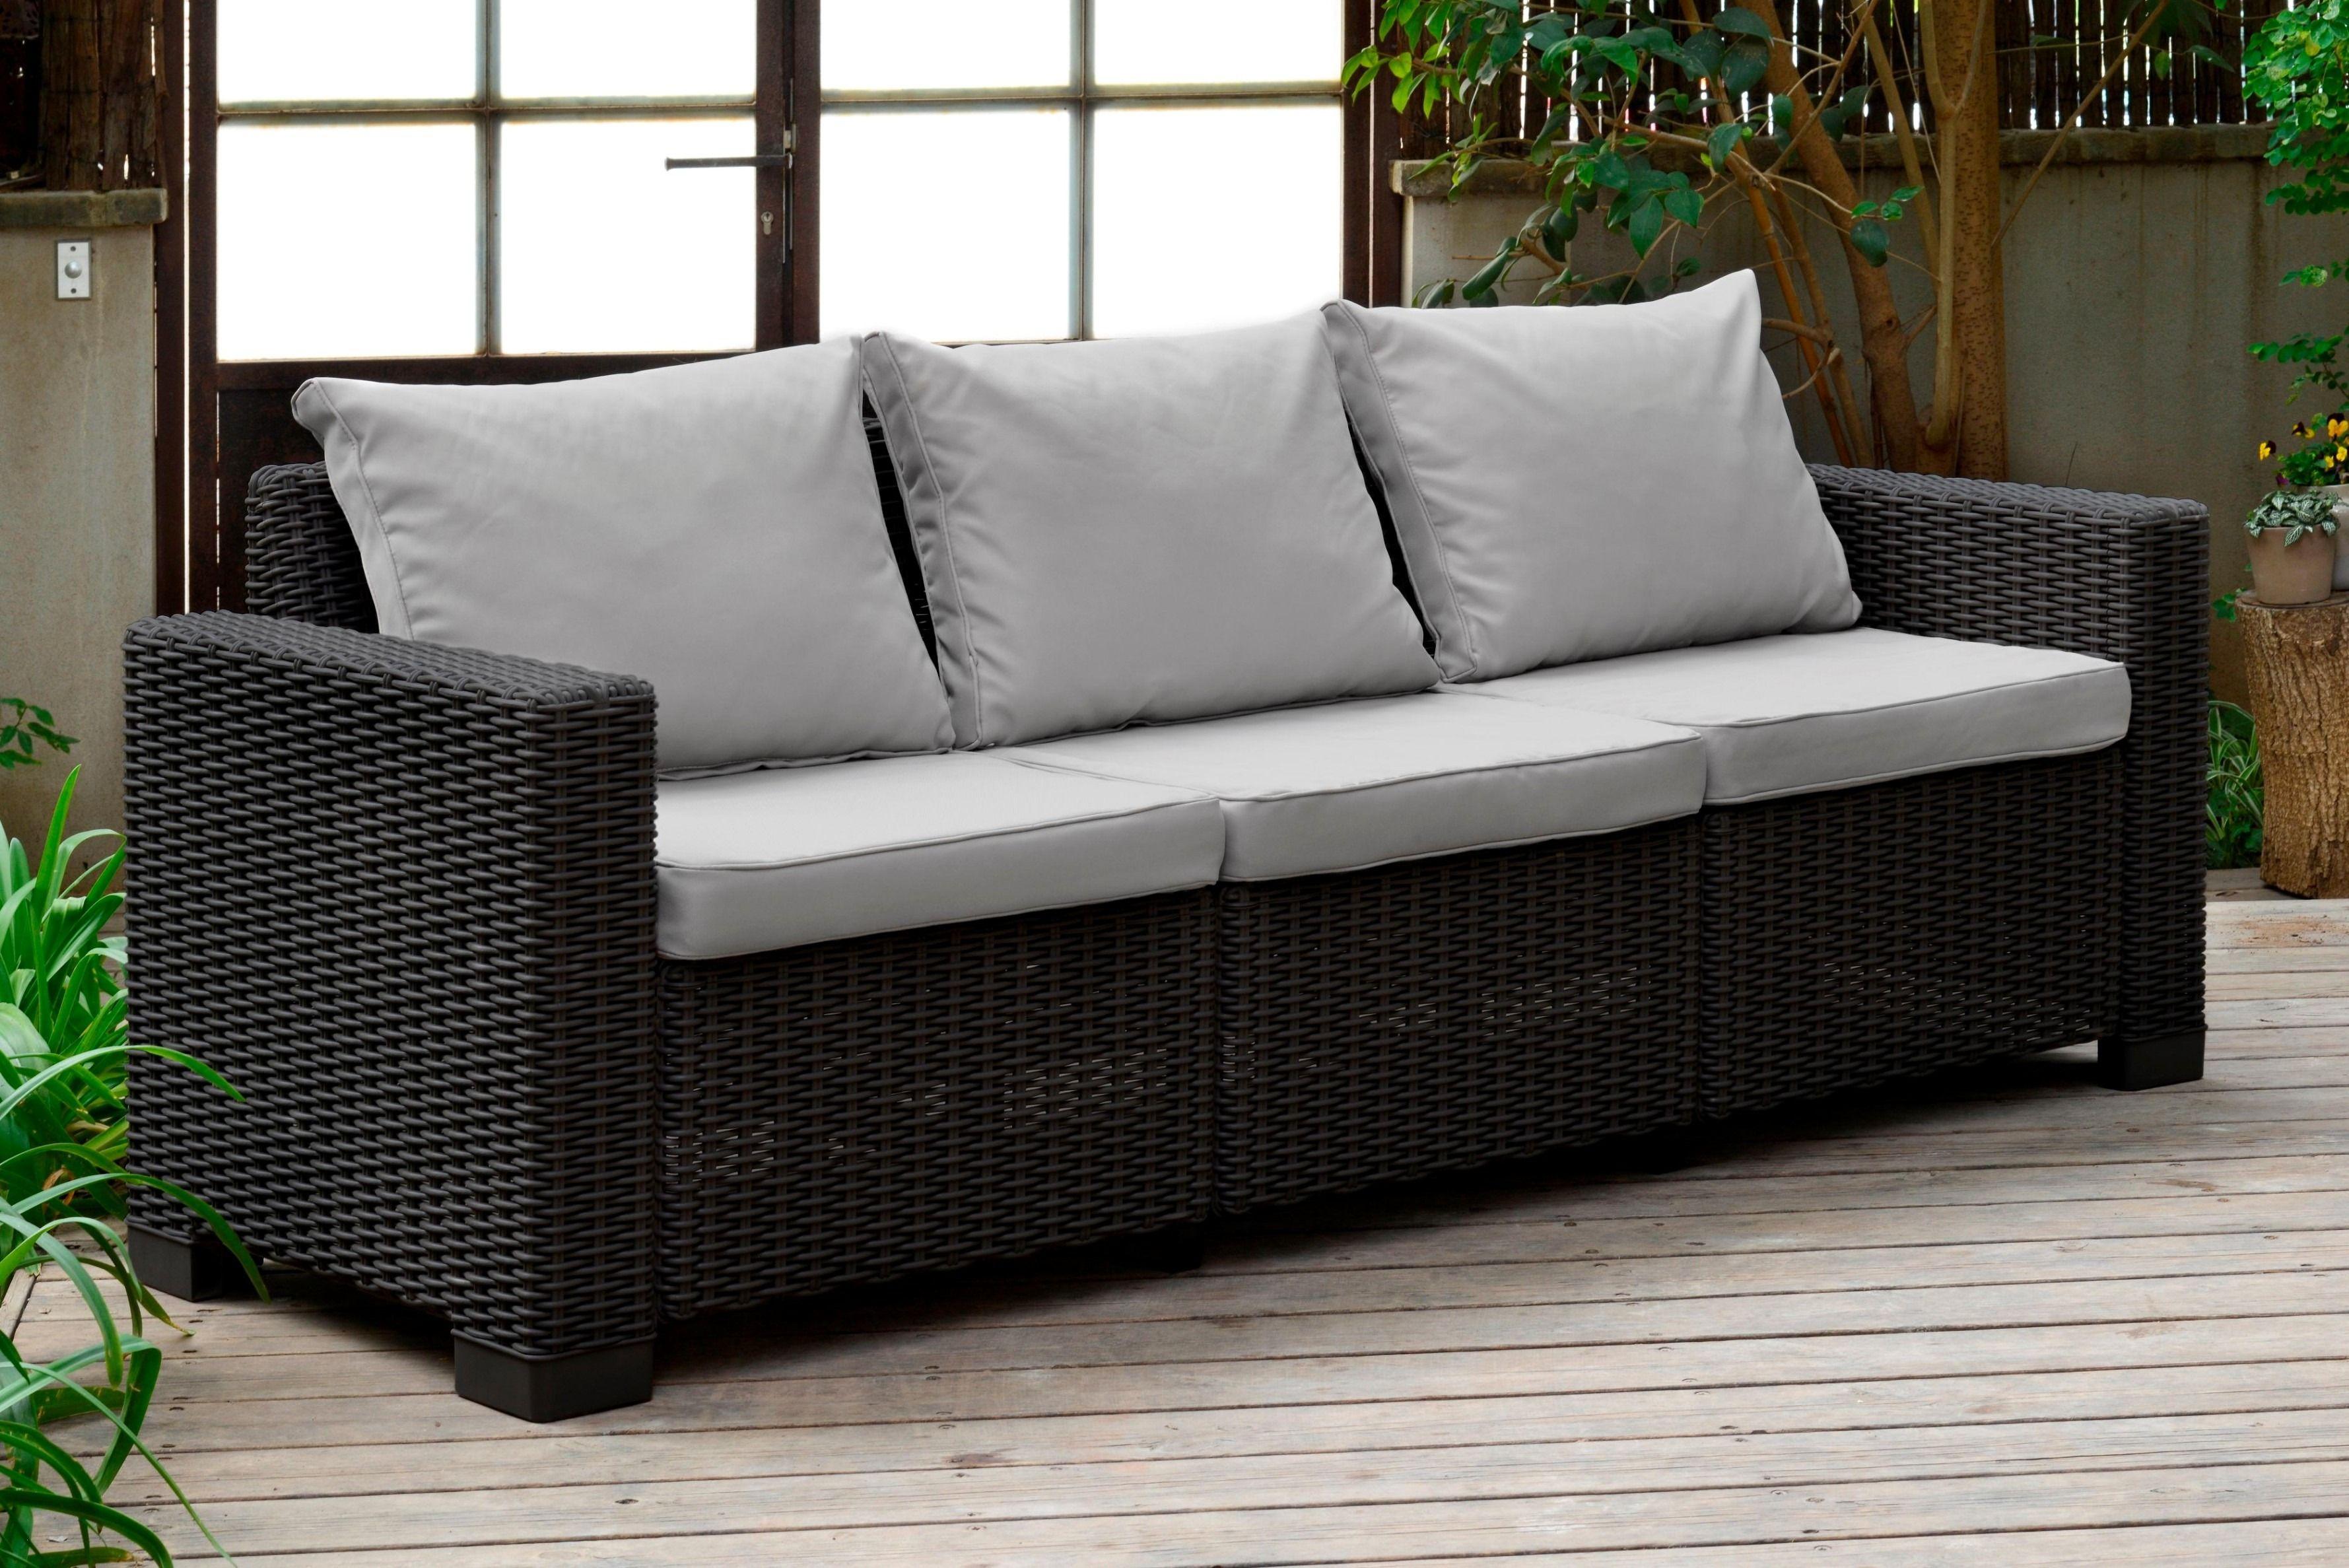 30 Einzigartige Sofa Del Amor Balkon Selber Bauen Lounge Mobel Couch Mobel